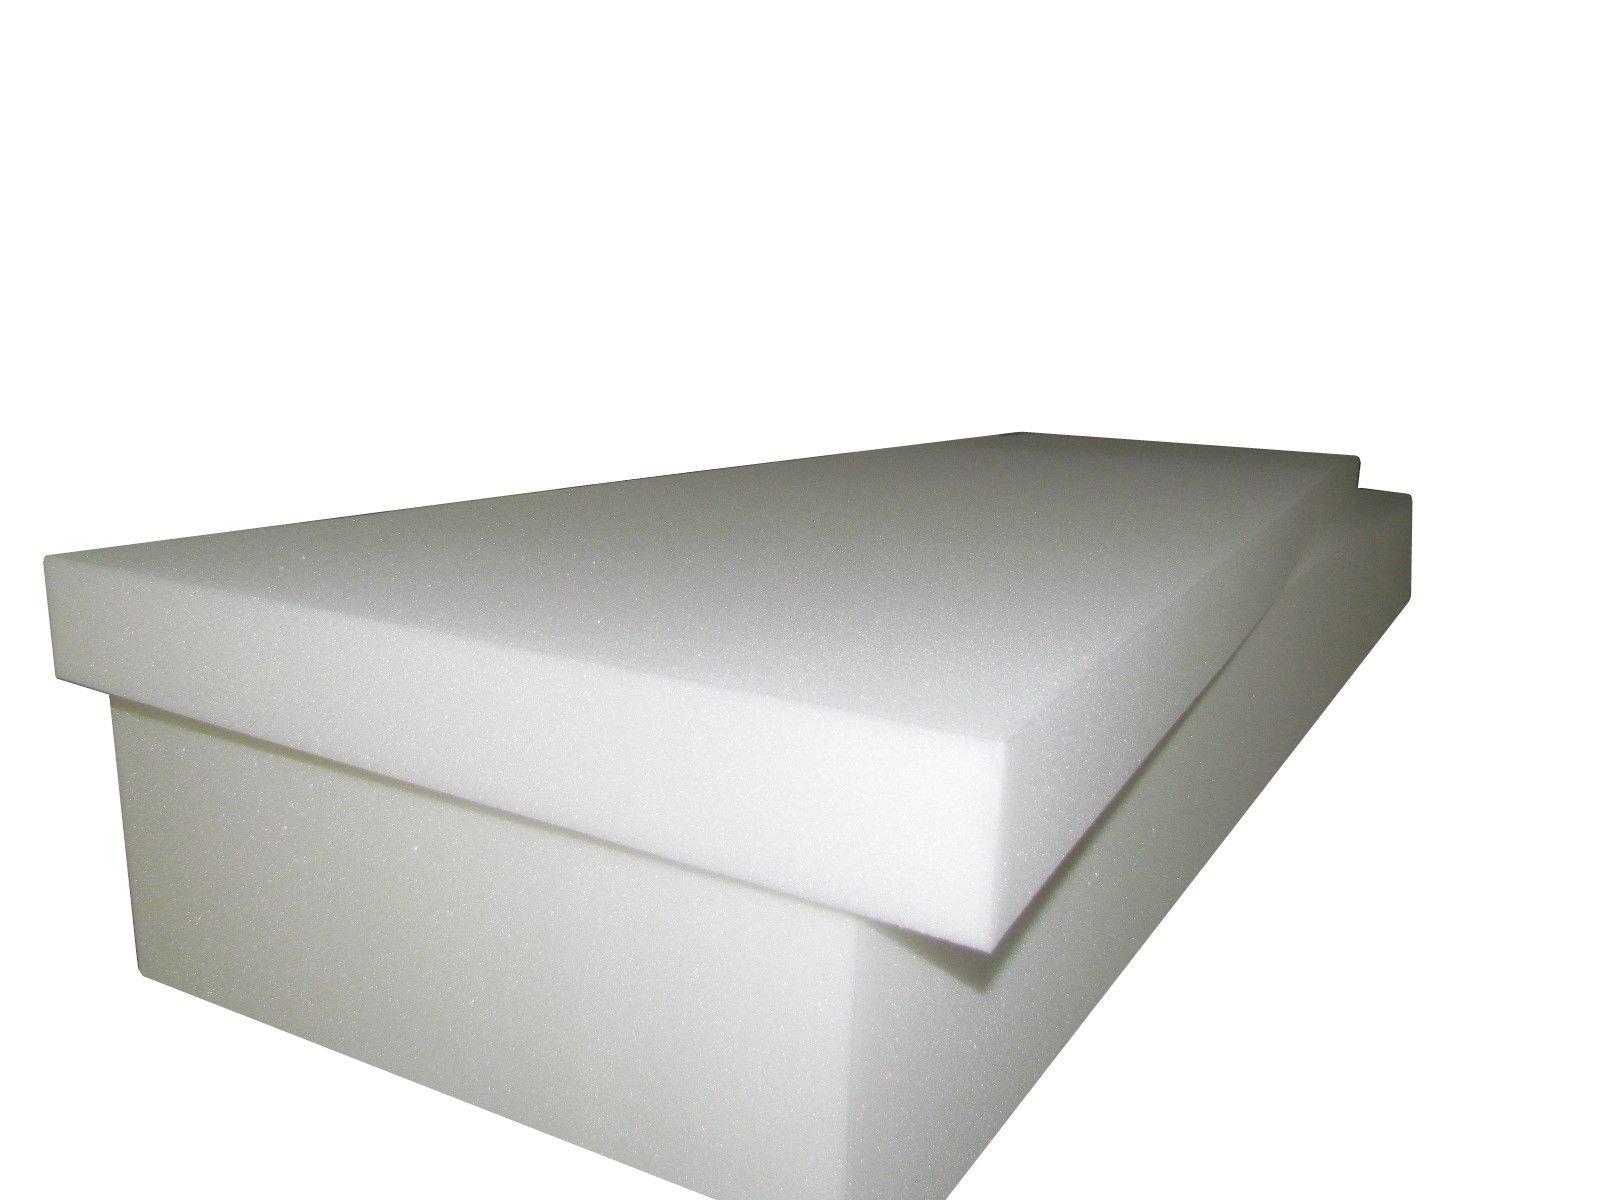 Isellfoam Foam Cushion 6''T x 24''W x 80''L (1536)''MEDIUM FIRM'' Sofa Seat Replacement Foam Cushion, Upholstery Foam Slab, Foam Padding by Isellfoam